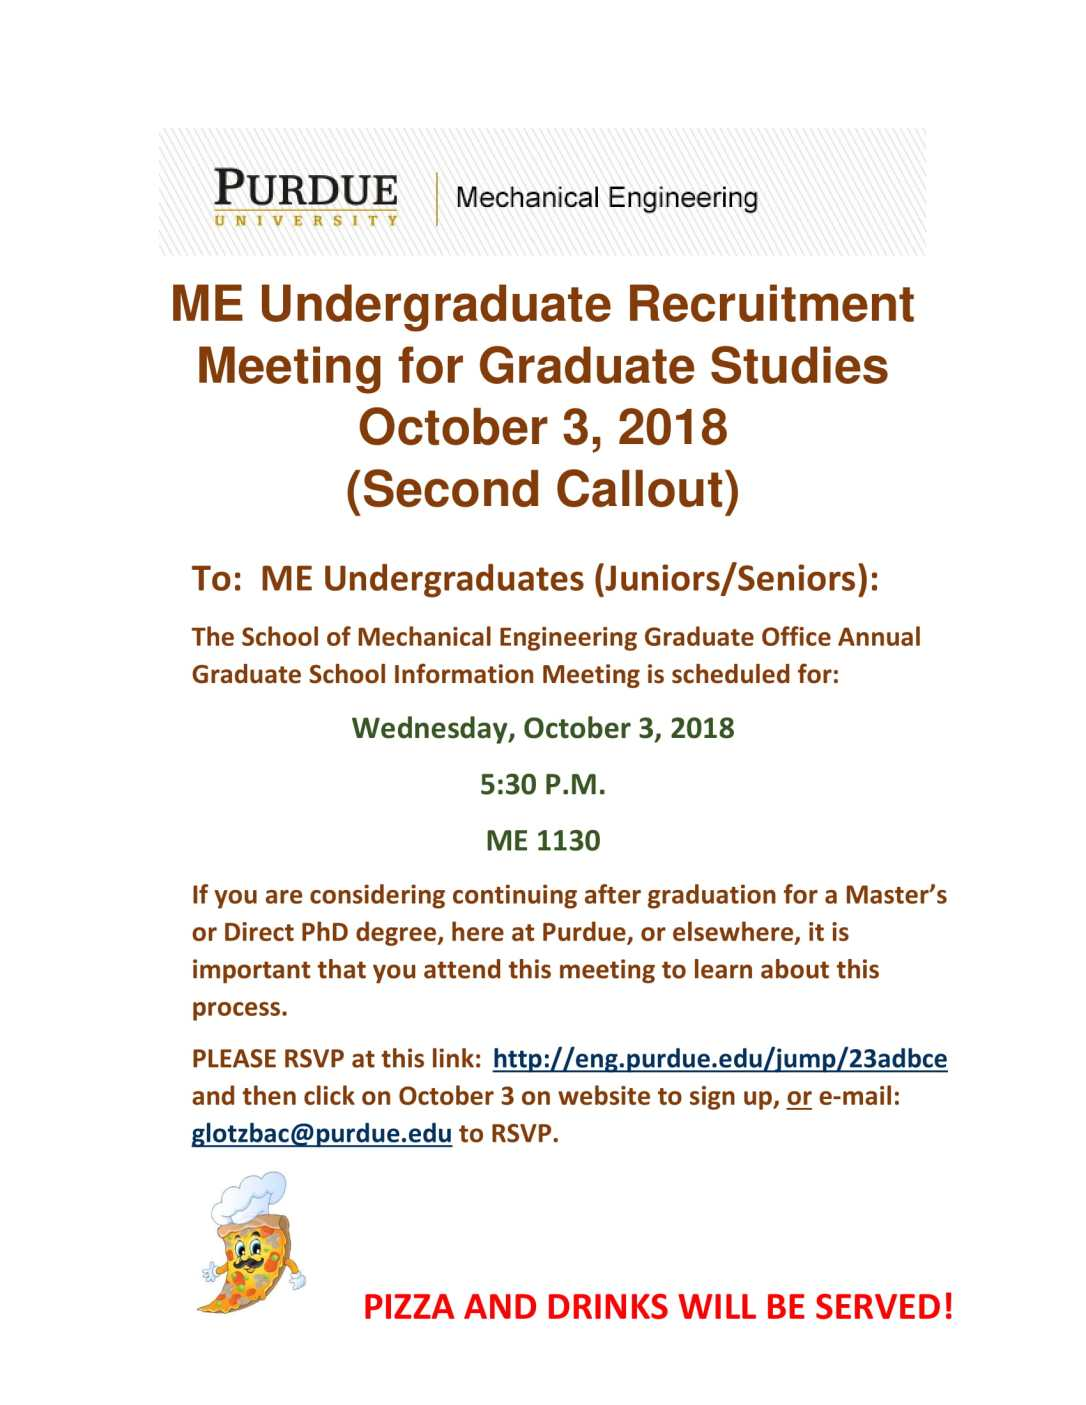 ME Undergraduate Recruitment Meeting for Graduate Studies Flyer 2018 (1)-1